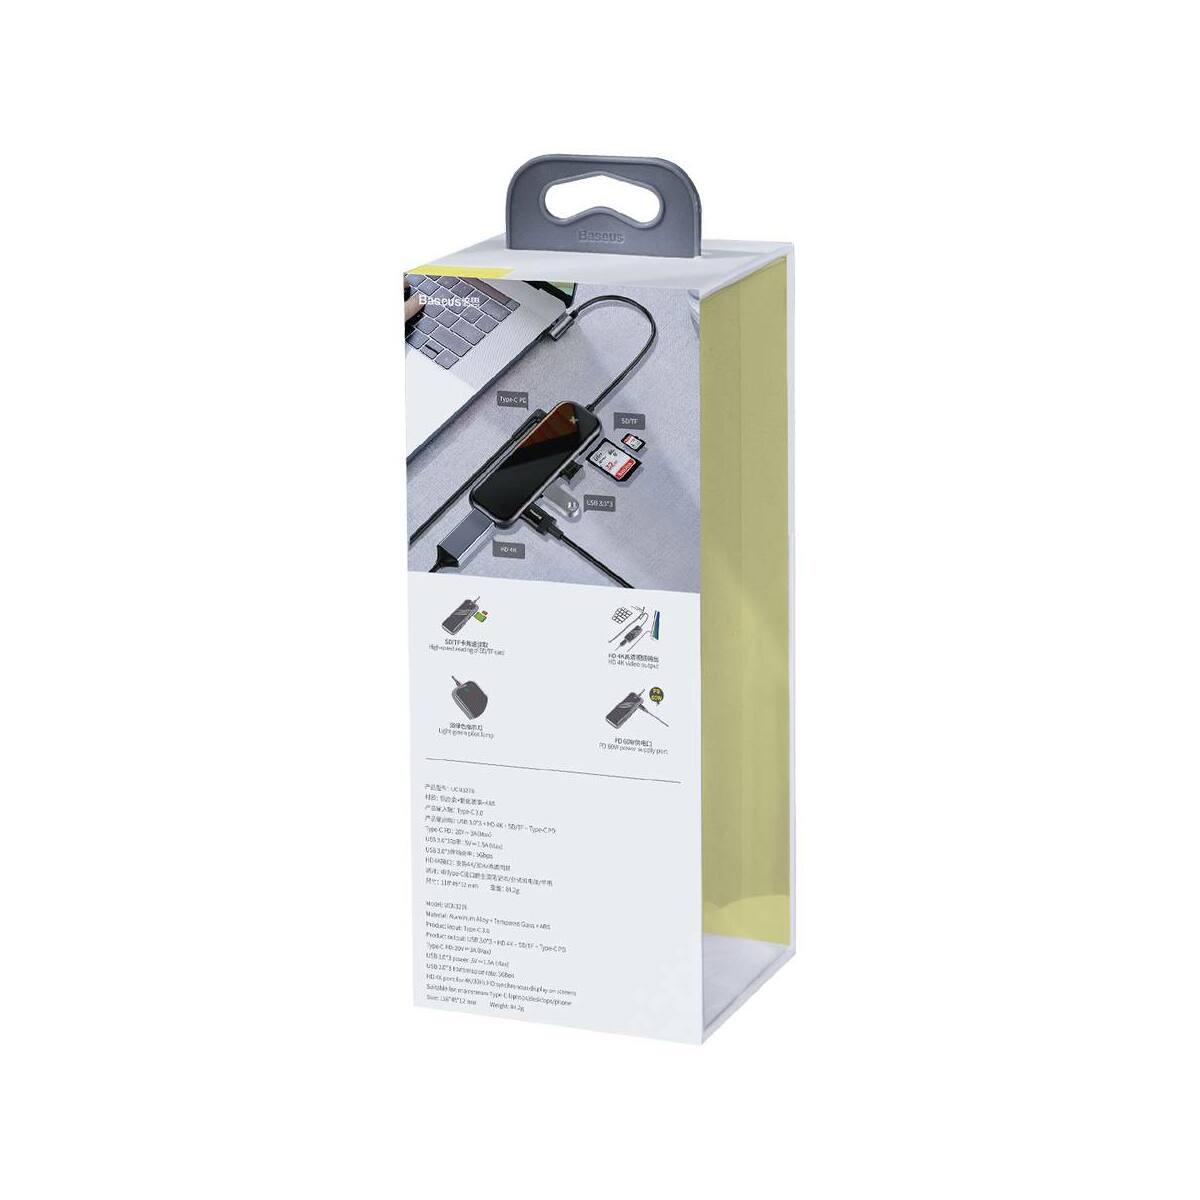 Baseus HUB, Multi-functional (Type-C bemenetről - 3xUSB3.0/HD4K/SD/TF/PD) adapter, szürke (CAHUB-CZ0G)